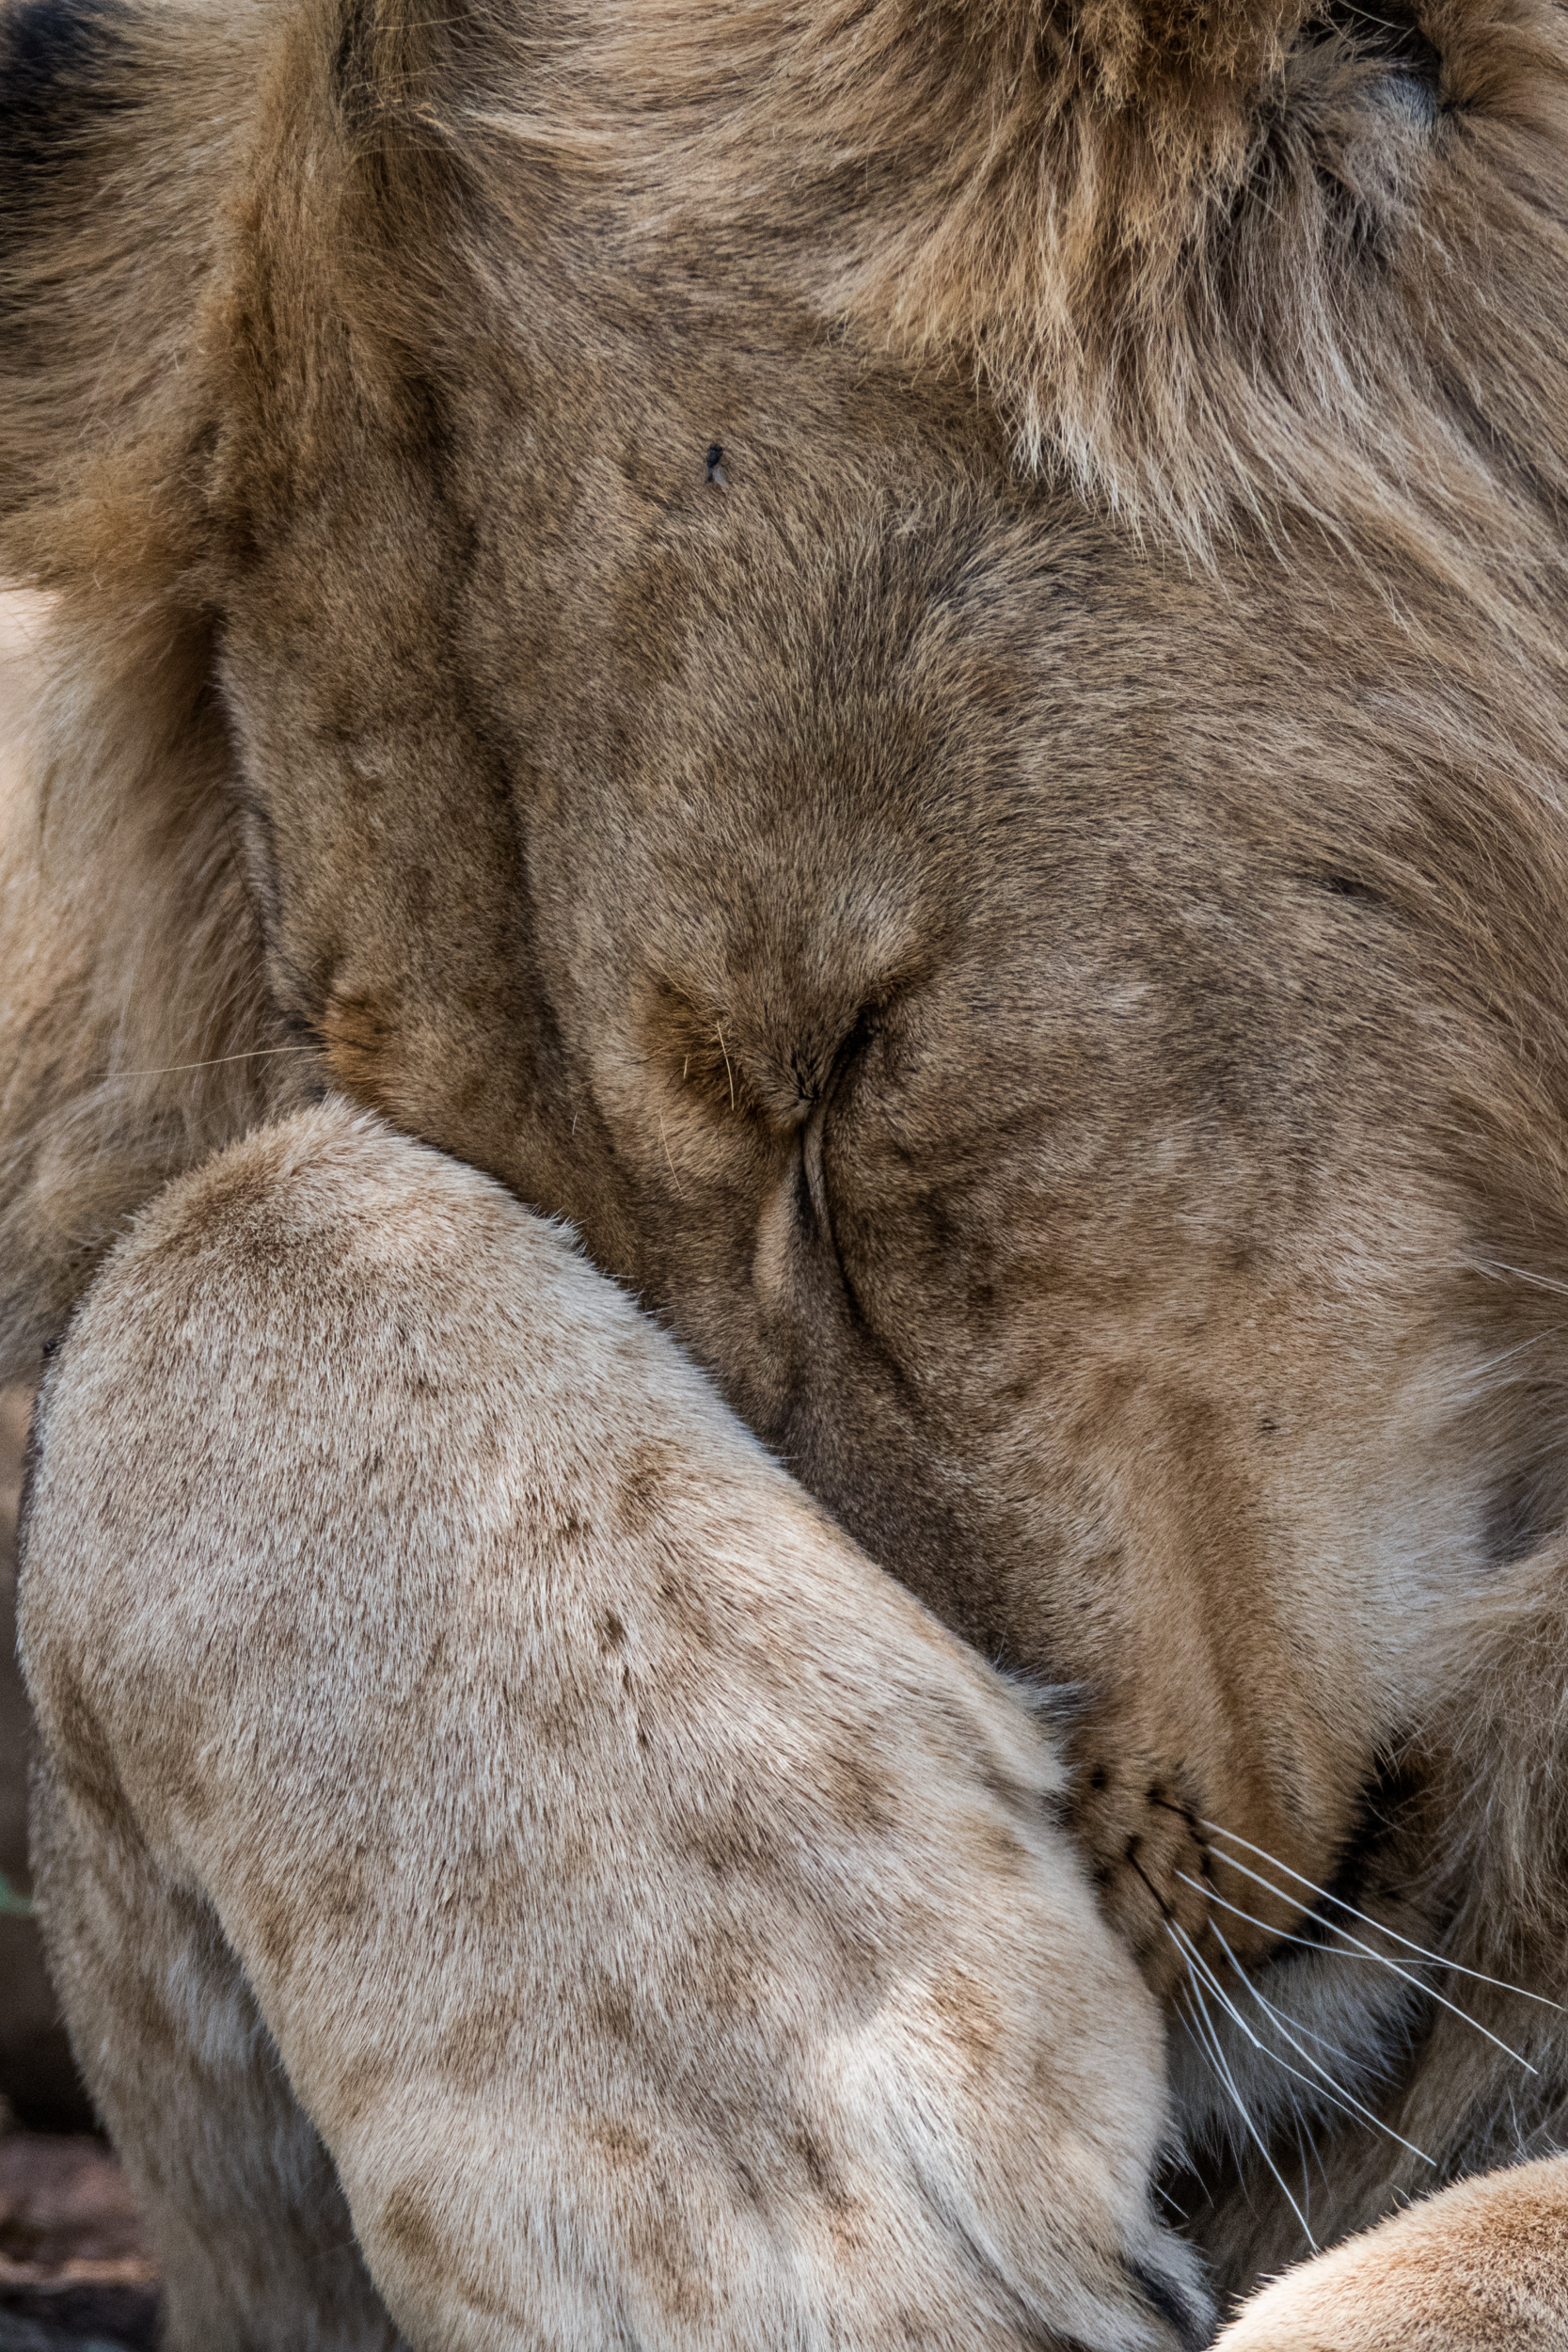 Lions-big-8.jpg